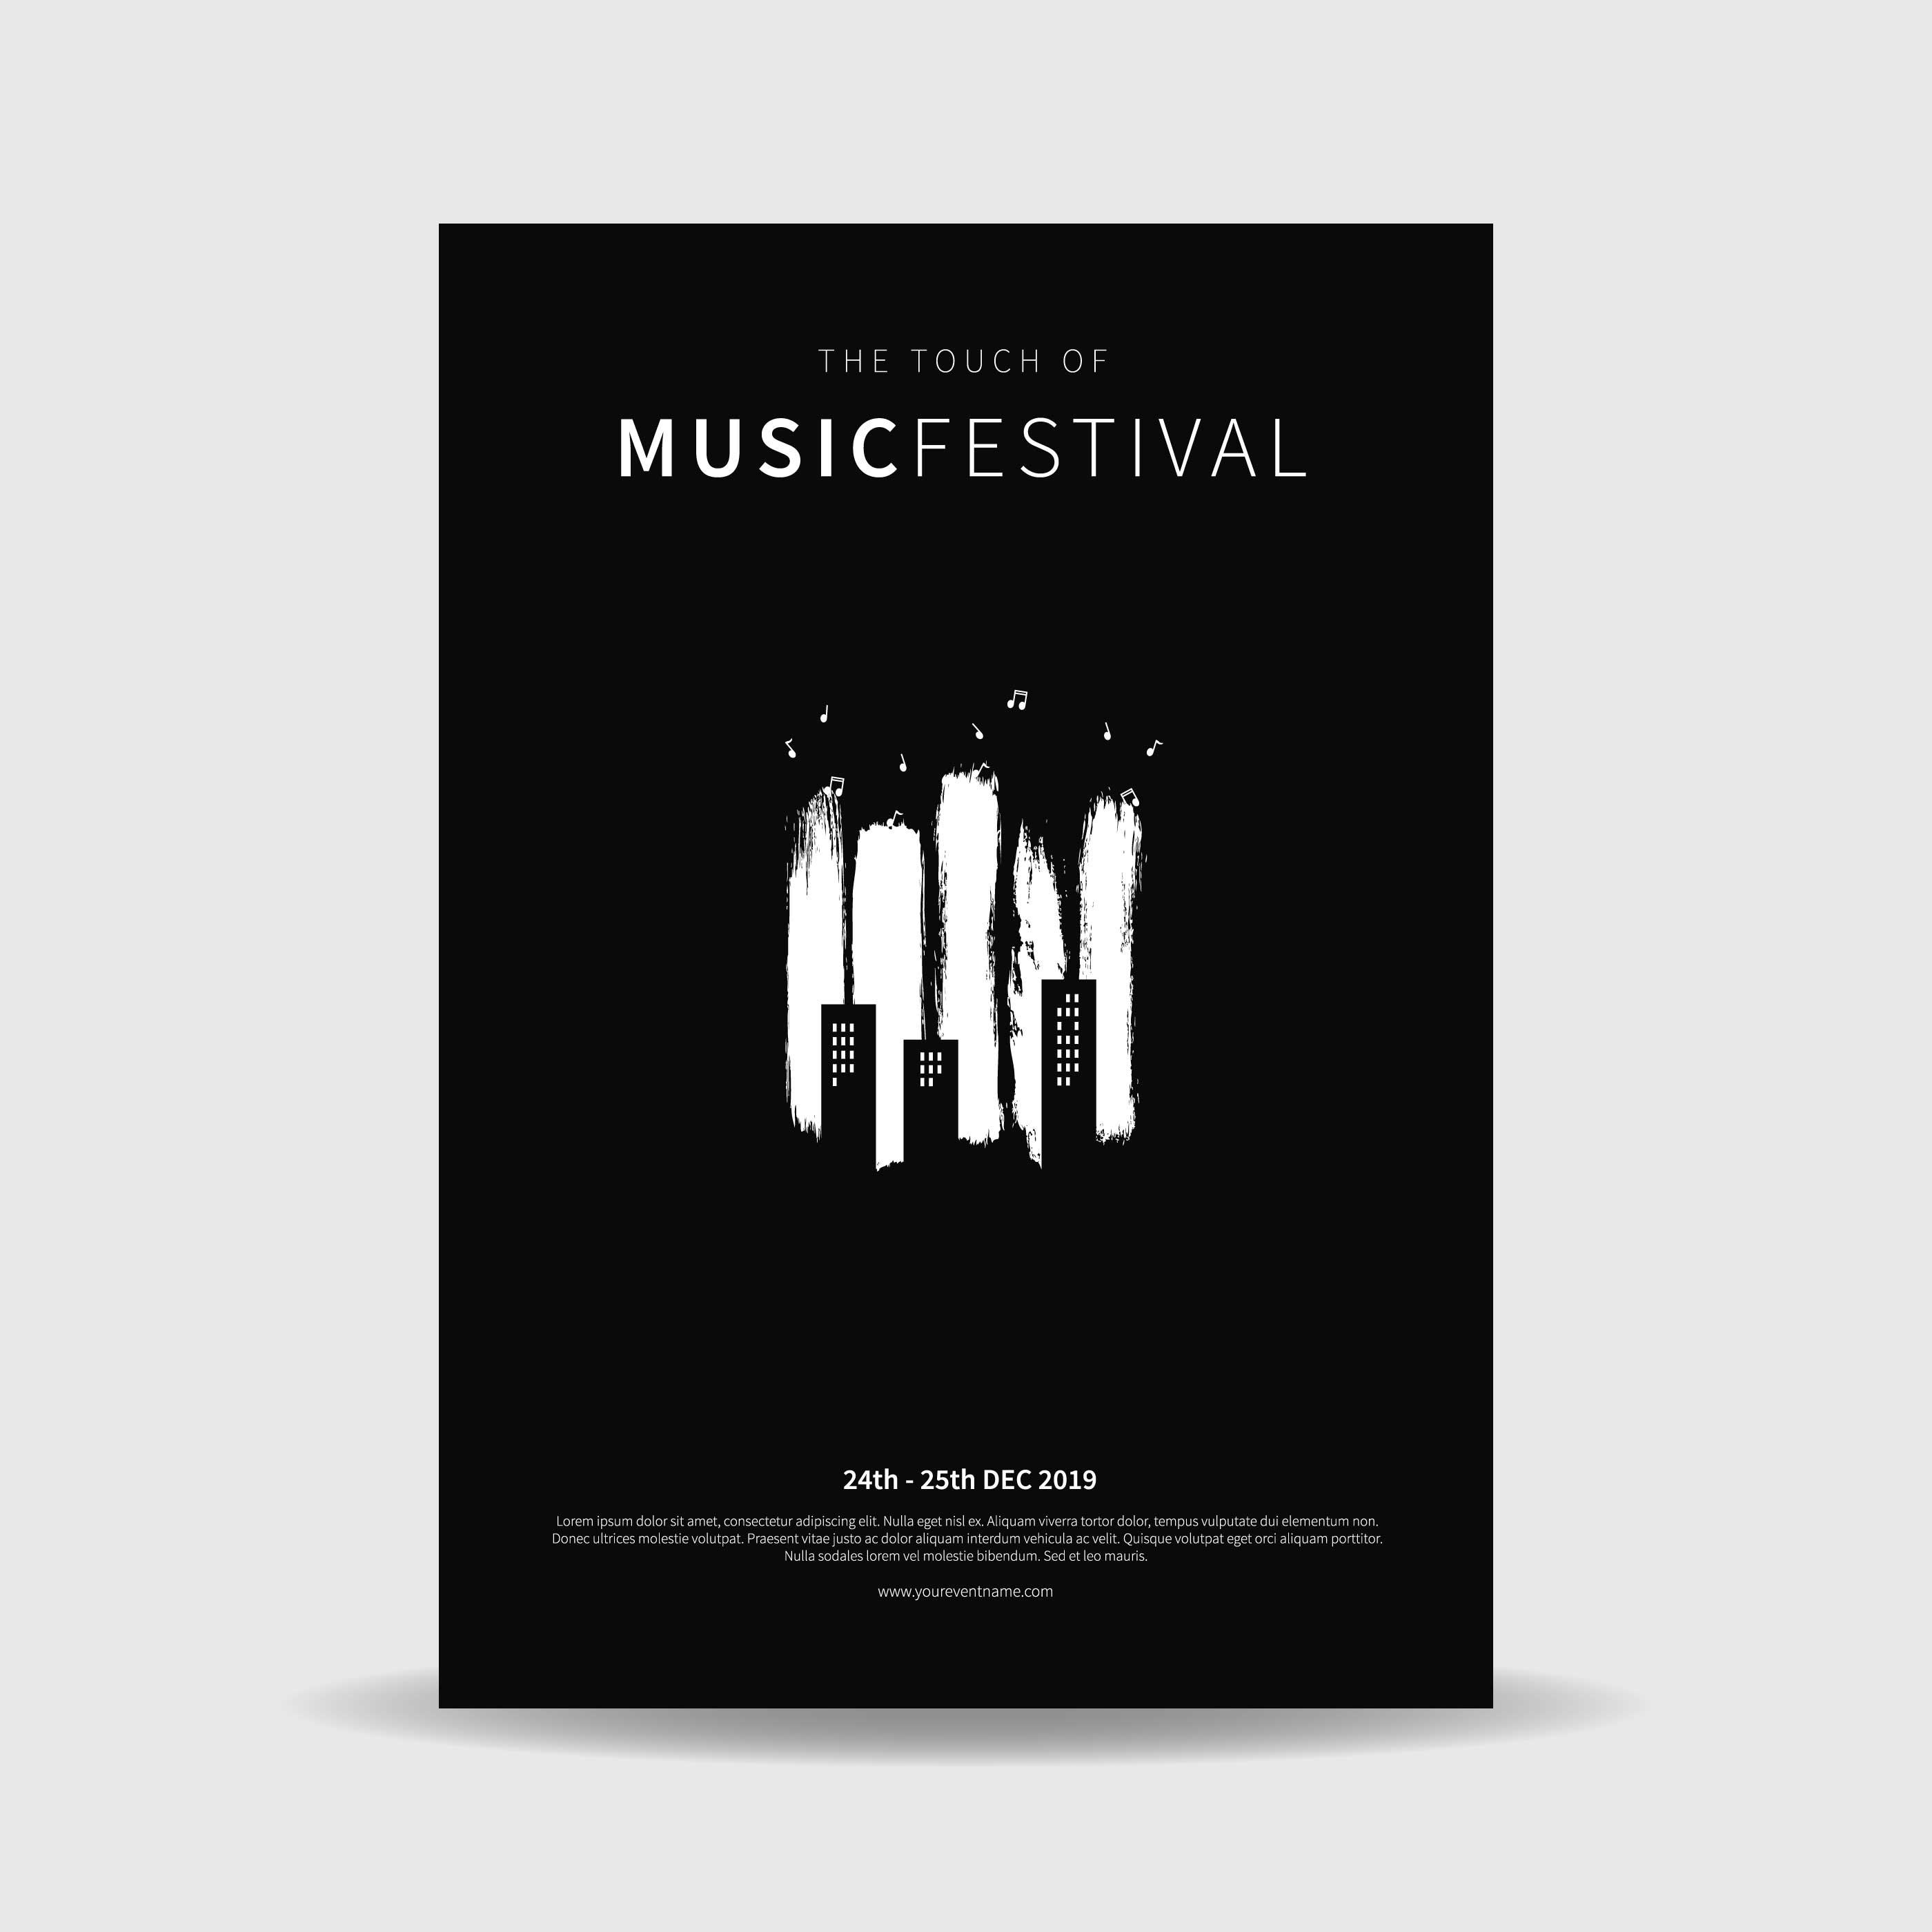 Take That 2 Black White Poster English Pop Group Photo Music Stars Picture Print